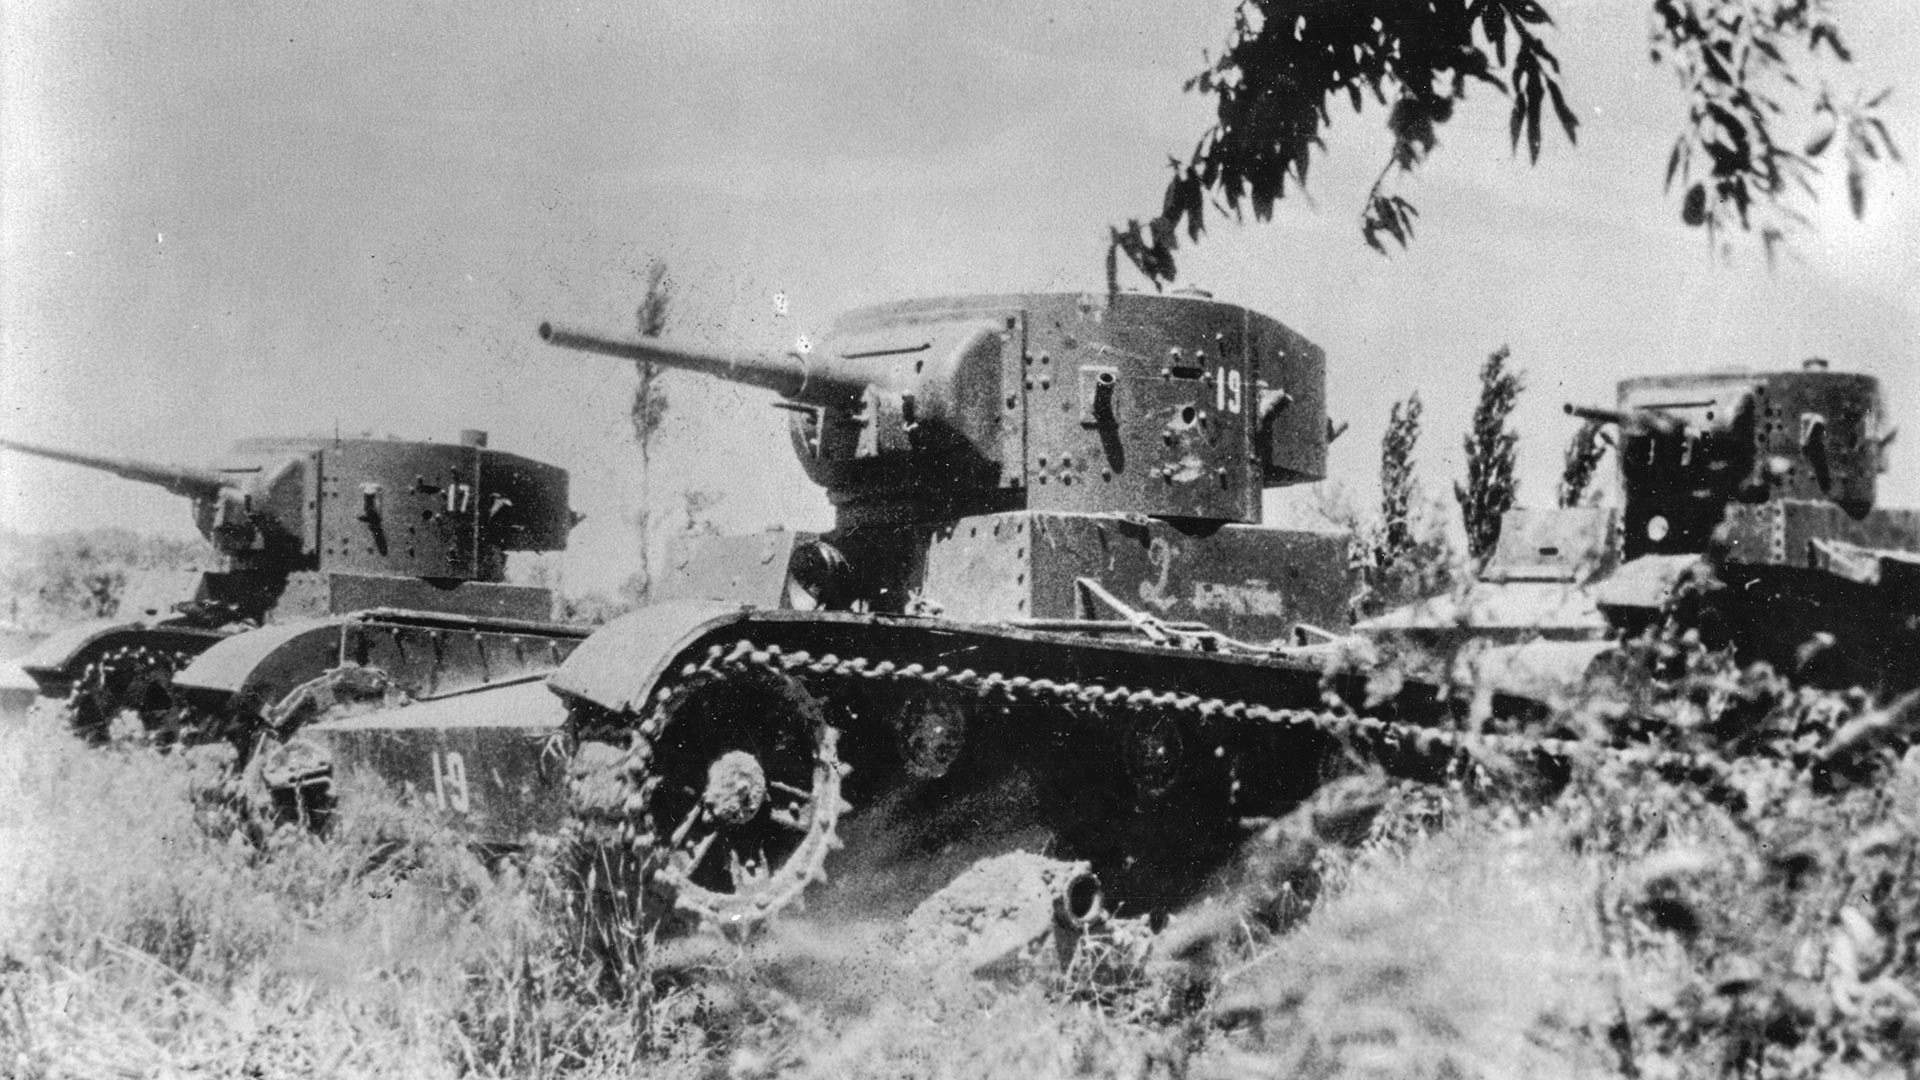 Tank T-26 Soviet di Spanyol.